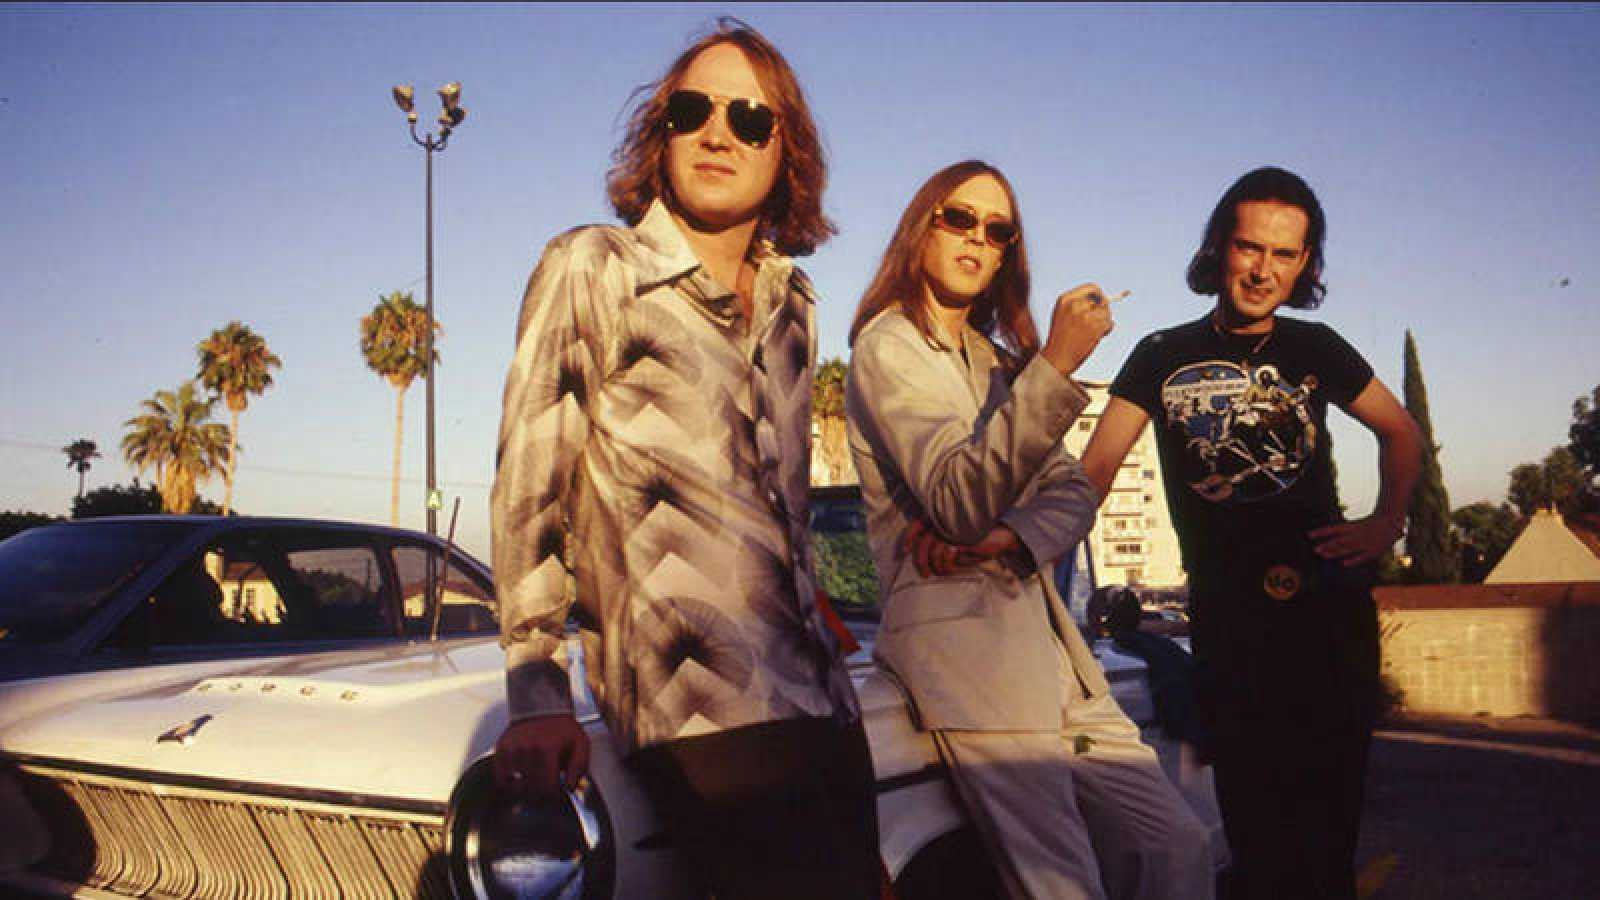 Urge Overkill ofrecerán un homenaje inédito al legendario Tom Petty